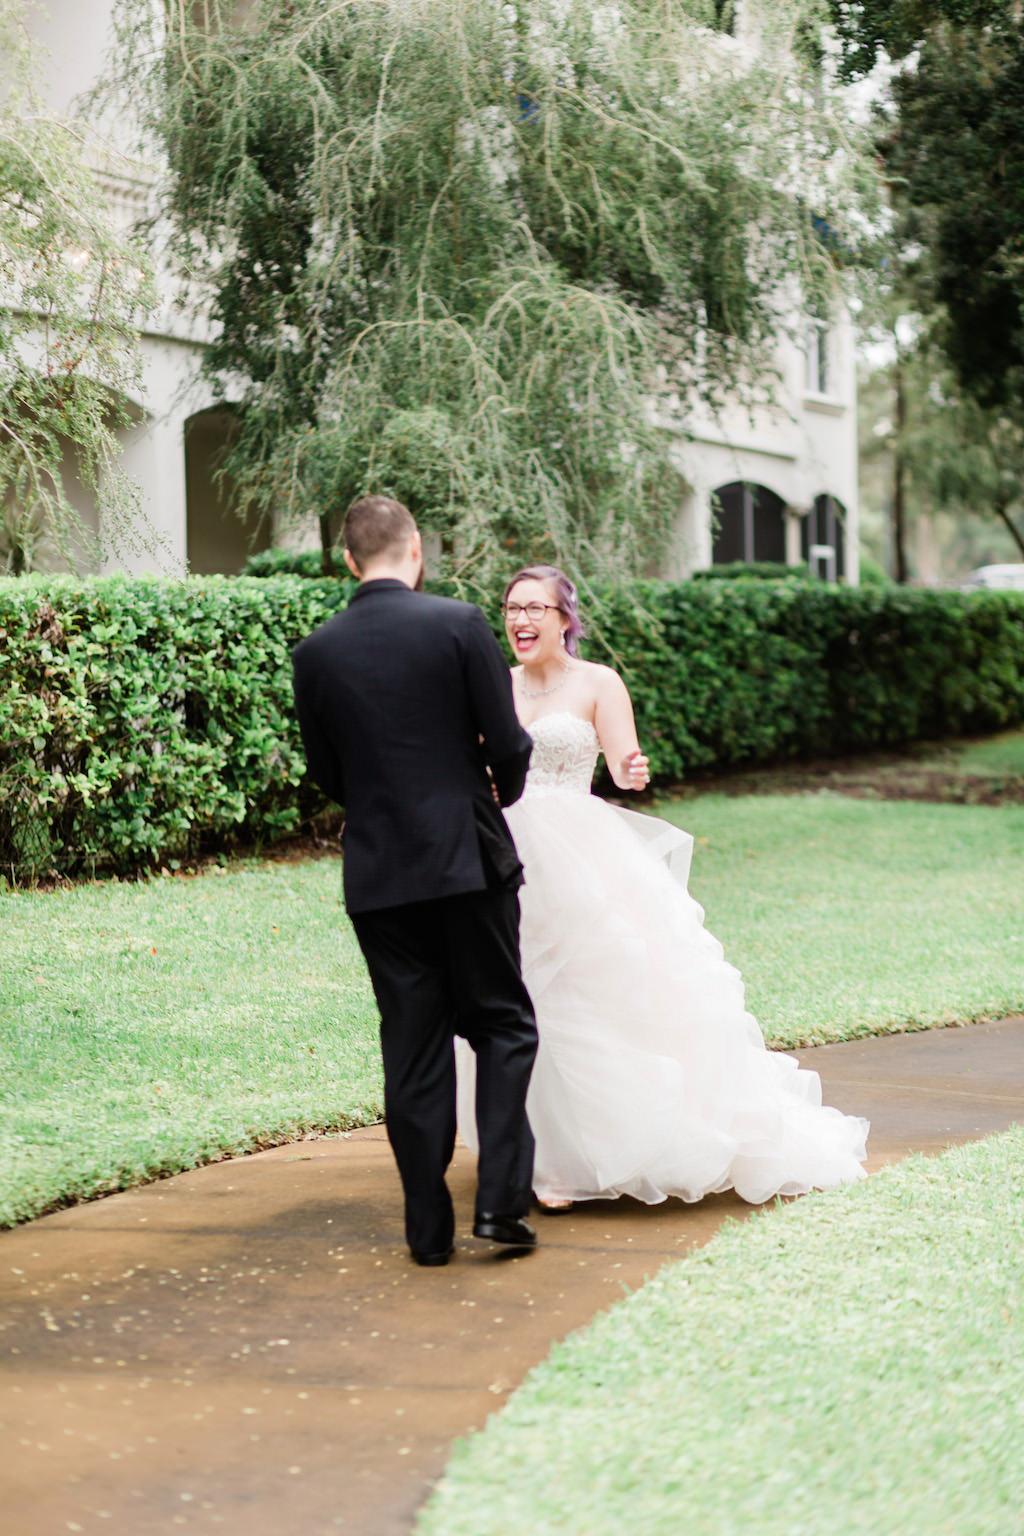 Modern Florida Bride and Groom First Look before Wedding